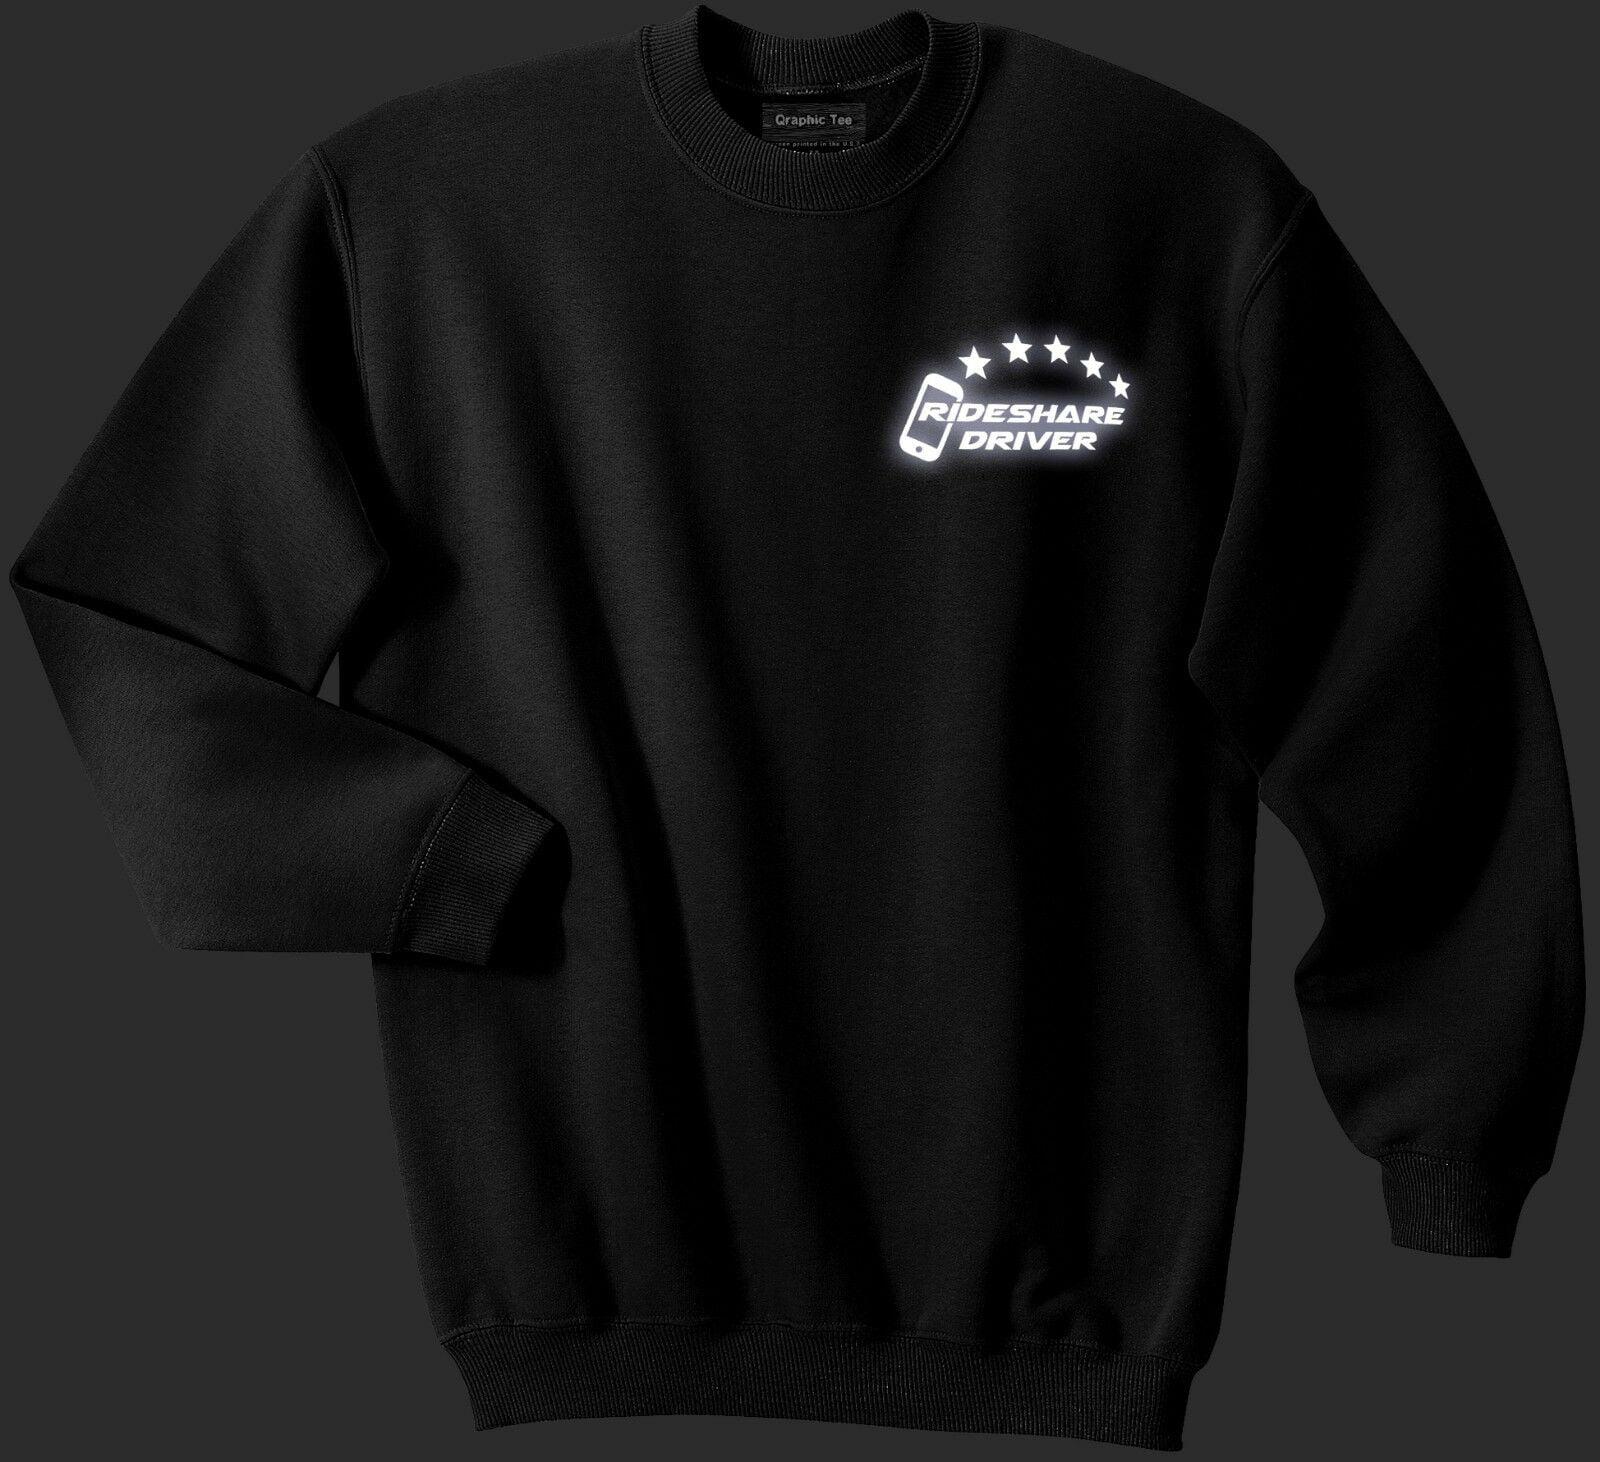 UBER logo Hoodie driver Rideshare App Black Hooded Pull Over Sweatshirt S-5XL